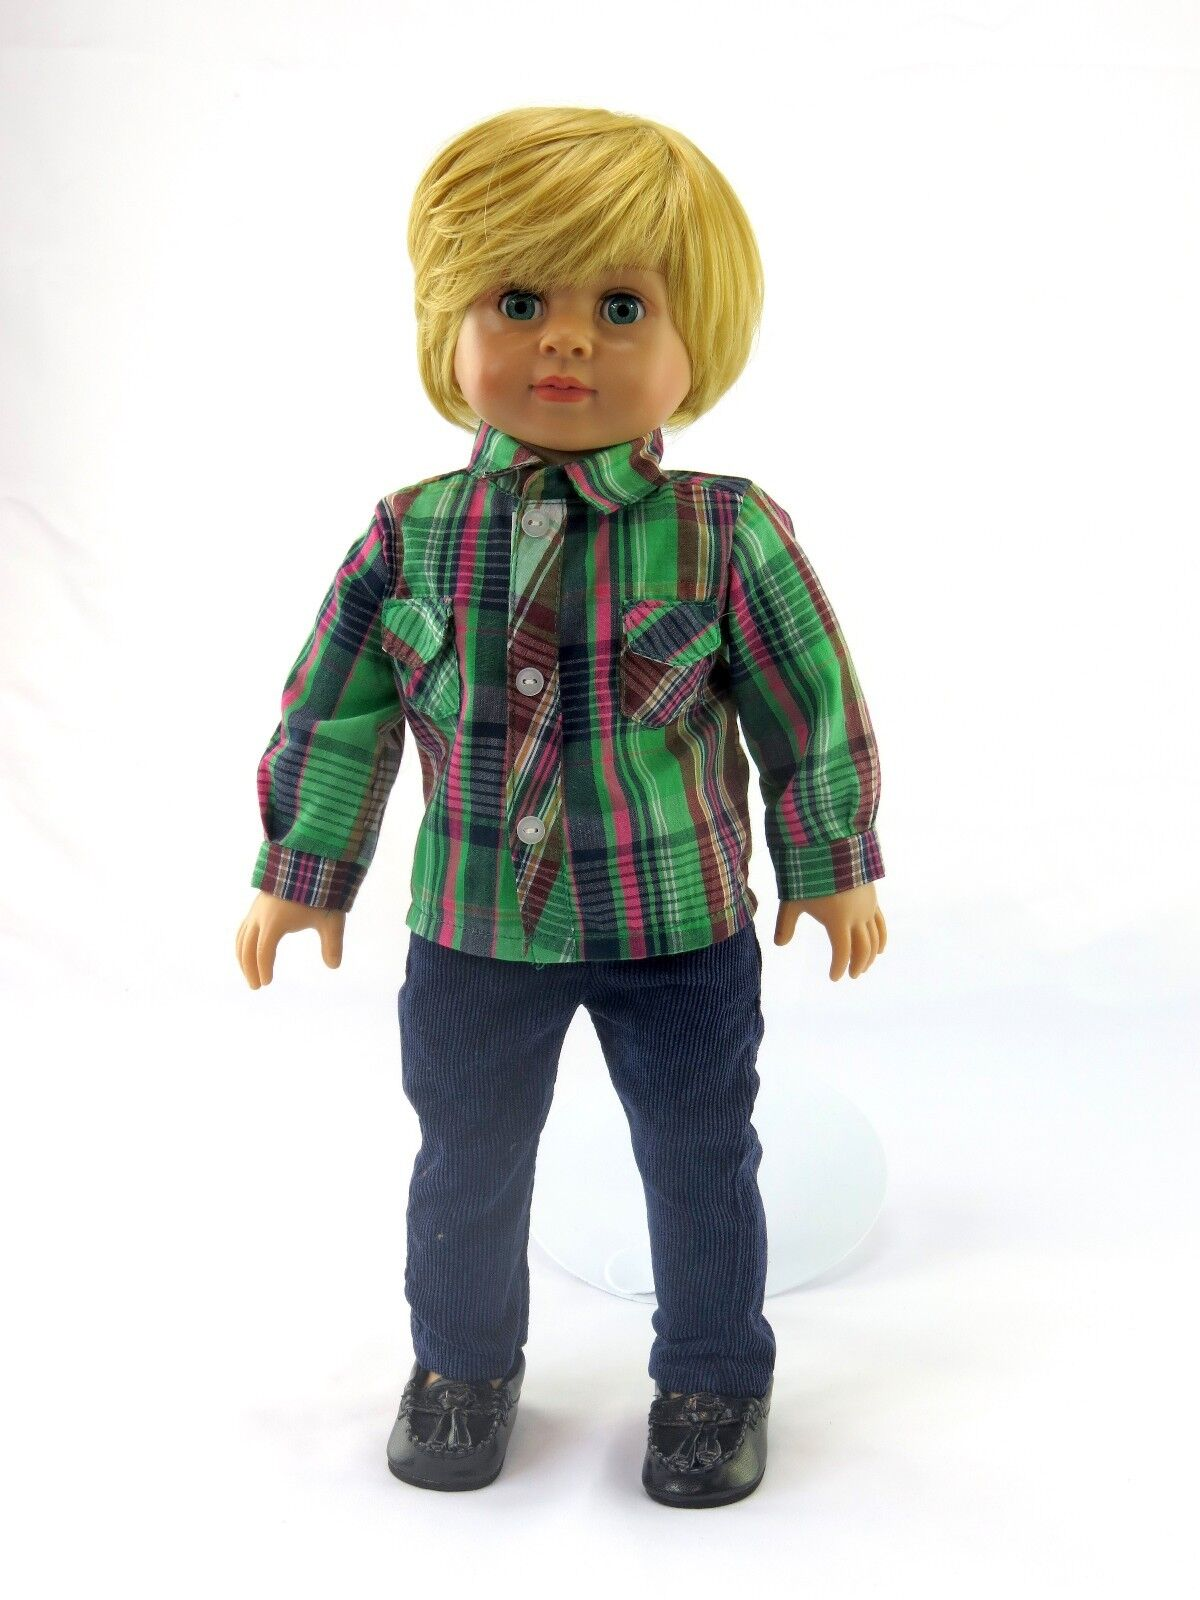 Green Plaid Shirt & Pants For 18 Inch American Girl Boy Doll